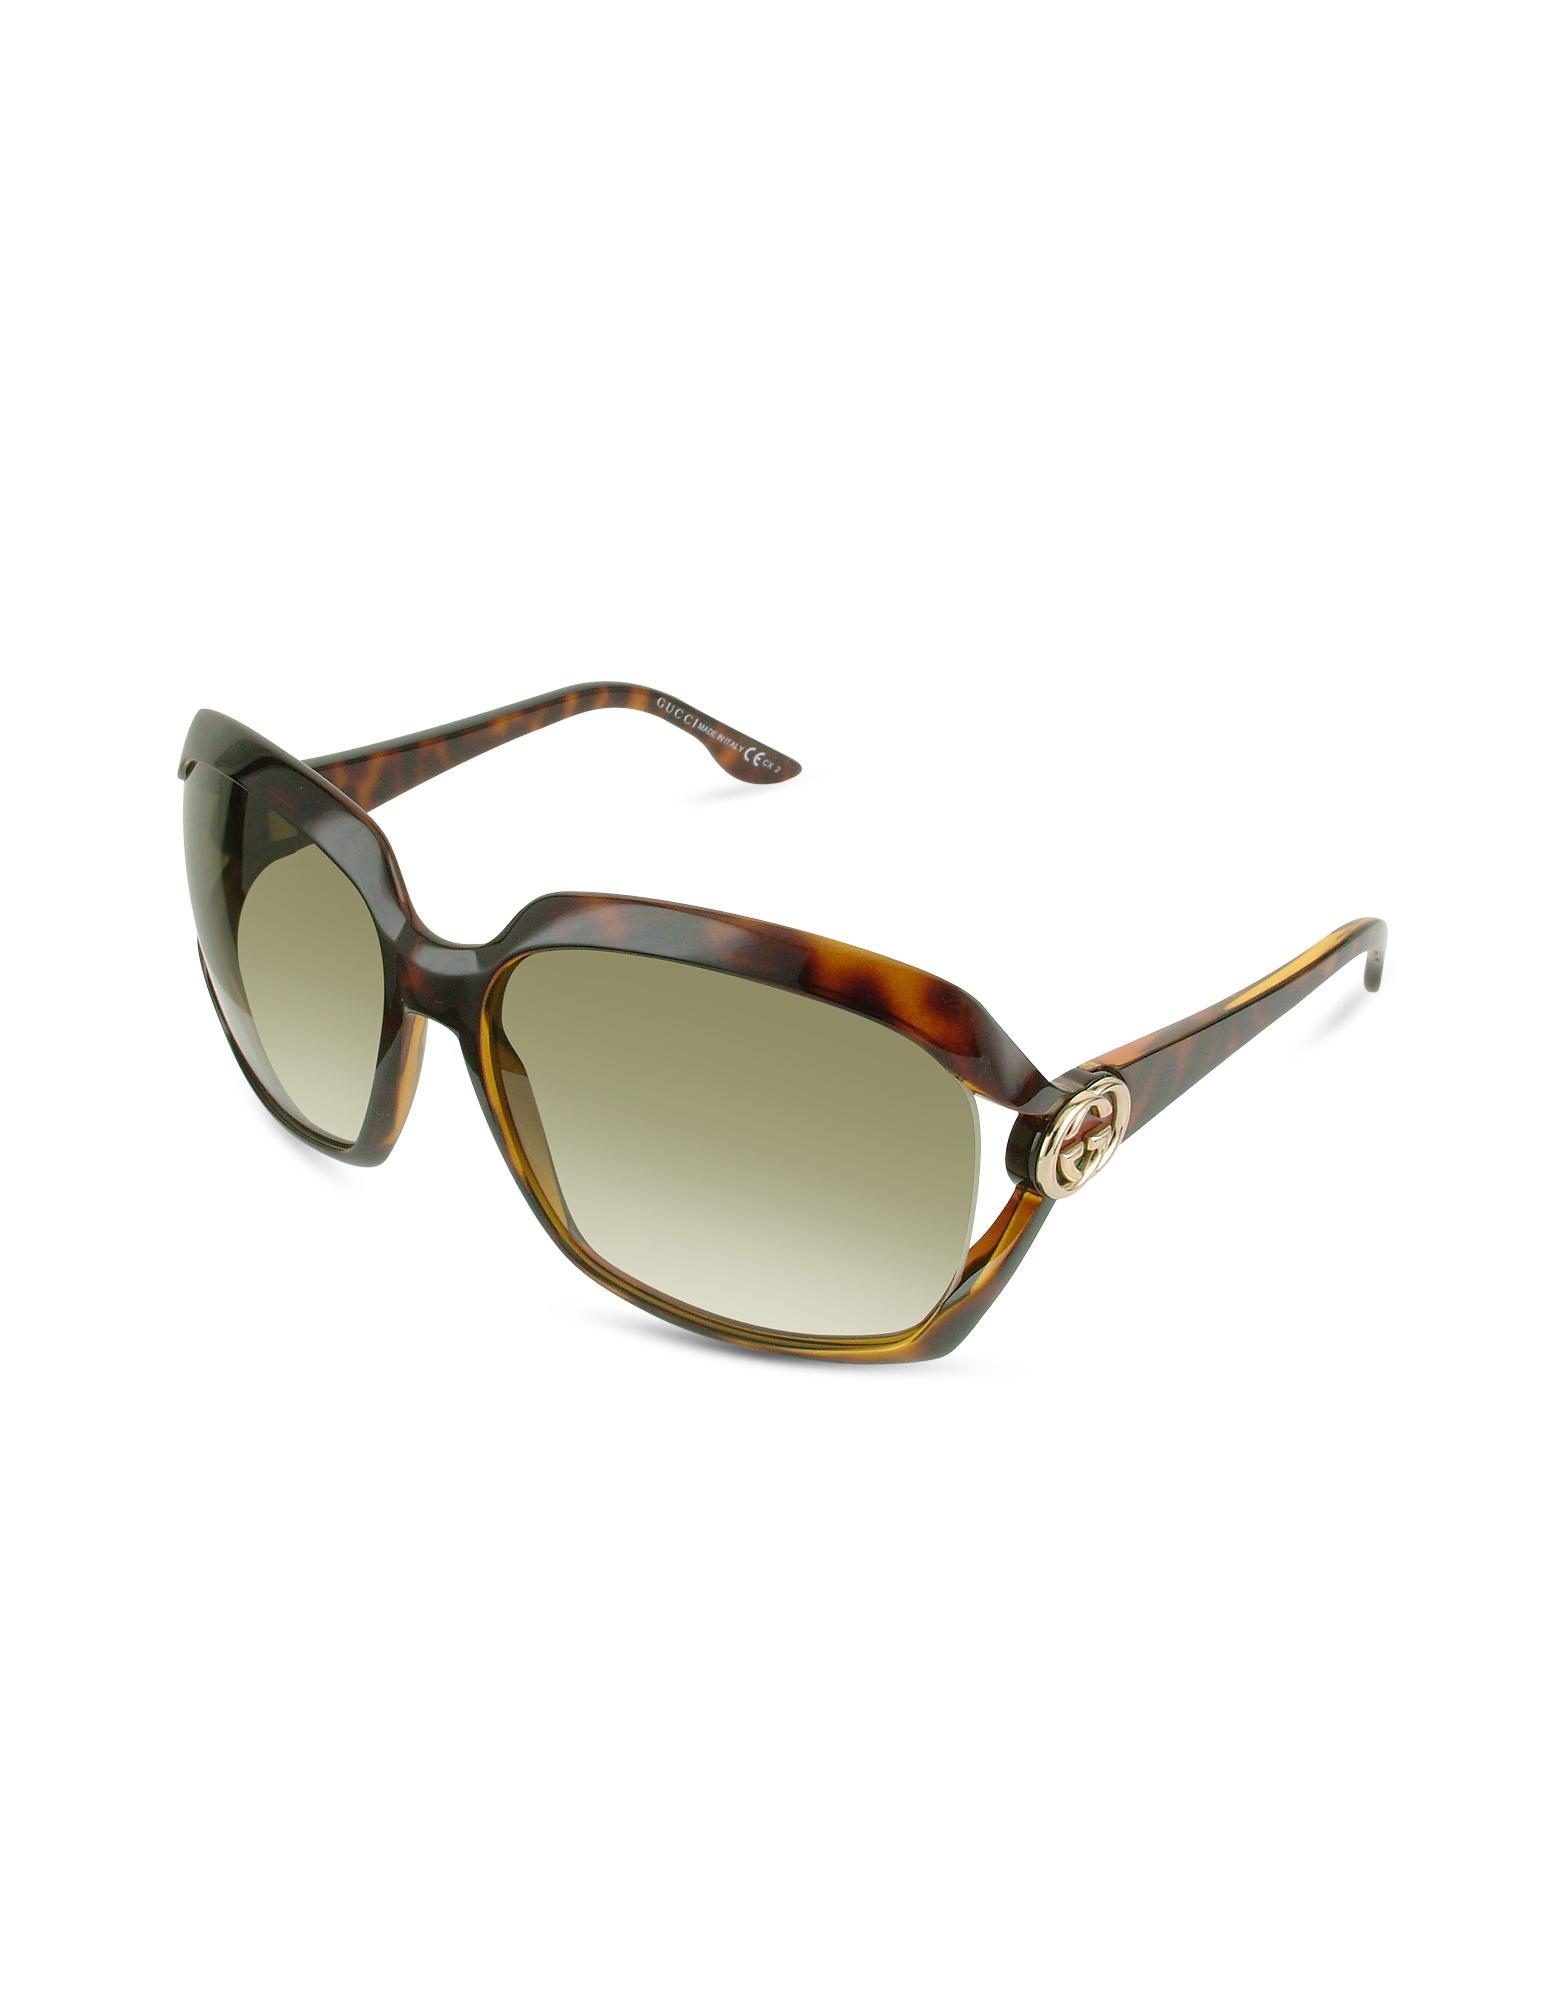 Gucci GG Web Vented Lens Sunglasses